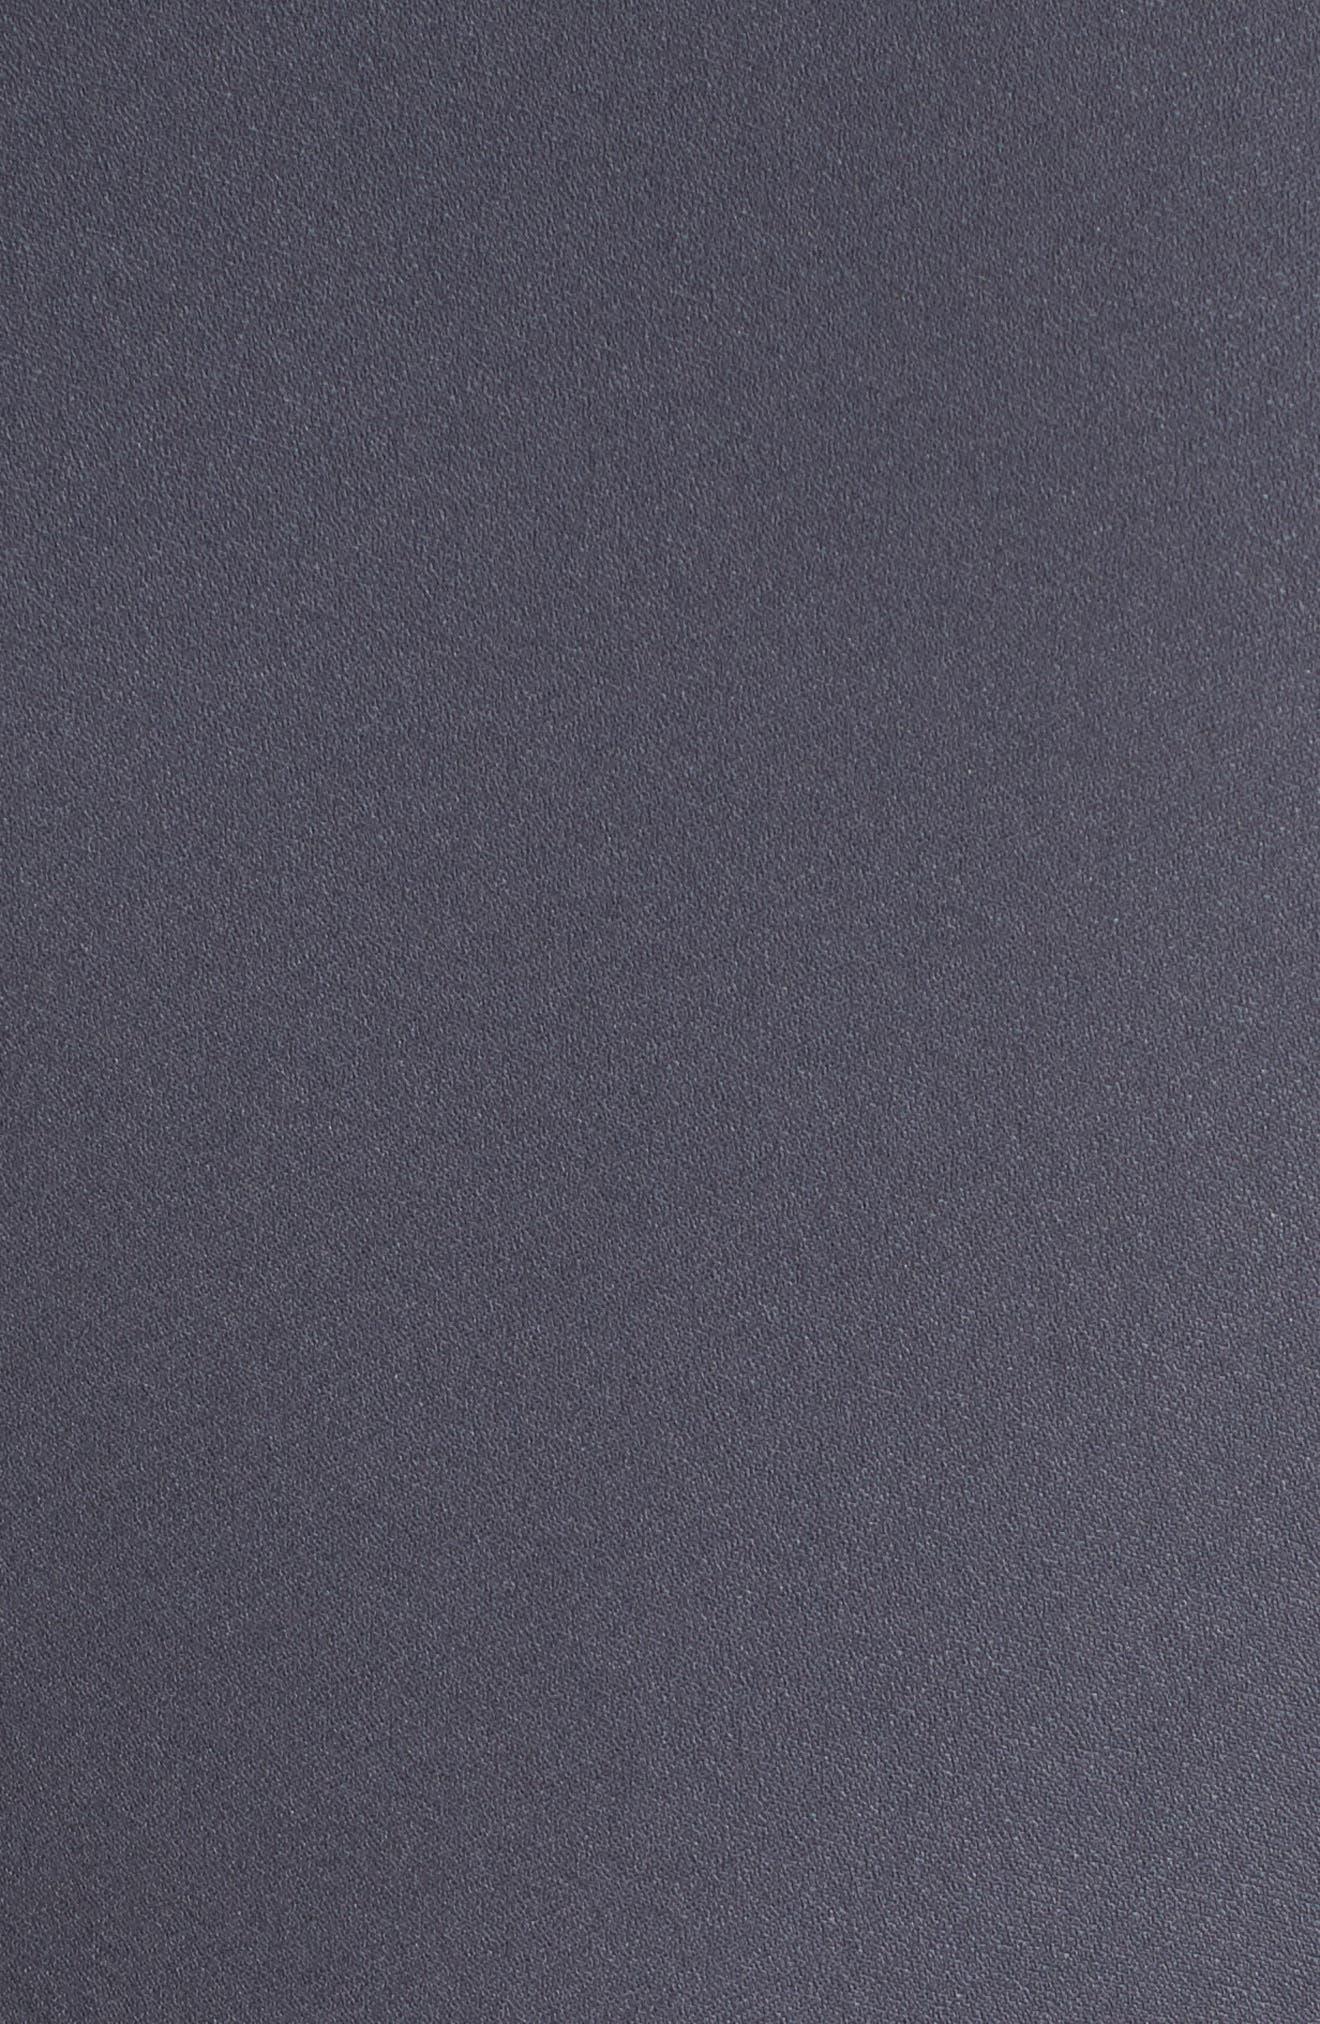 Bell Sleeve Sheath Dress,                             Alternate thumbnail 5, color,                             410